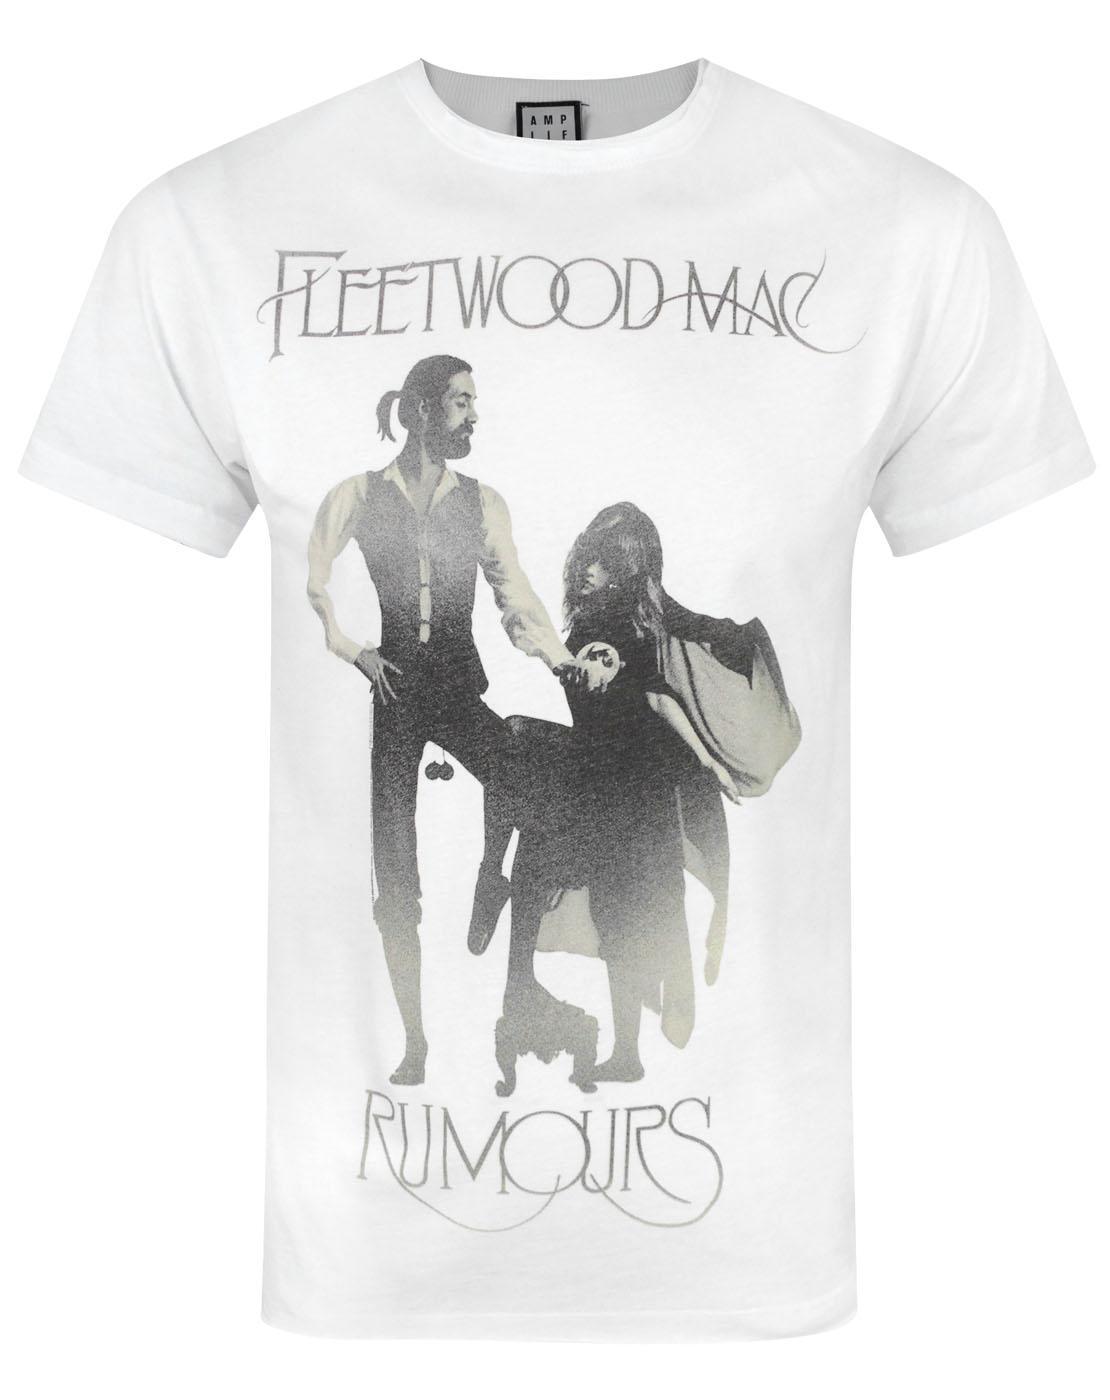 Design t shirt on mac - 2017 Cool Men Amplified Fleetwood Mac Rumours Design Men S Fashion T Shirt Hipster Tops Customize Printed Short Sleeve Tees